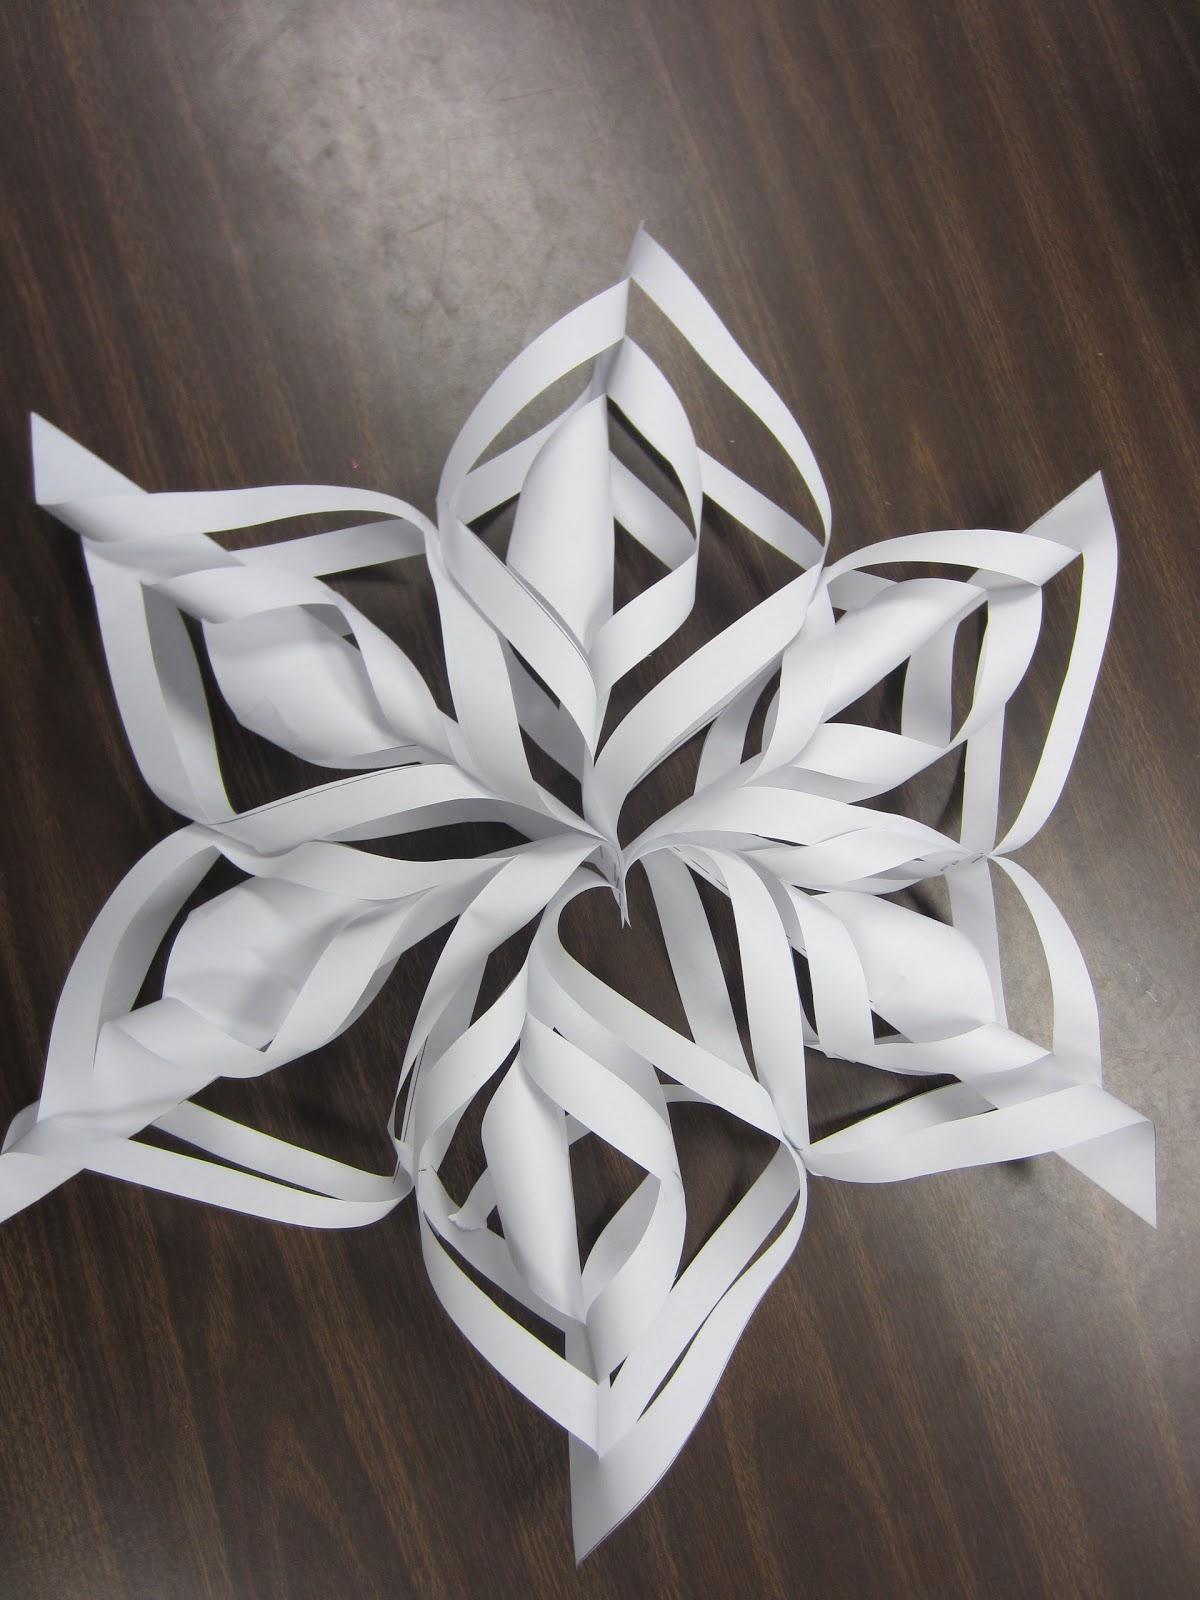 Simply The Classroom Handmade Snowflakes